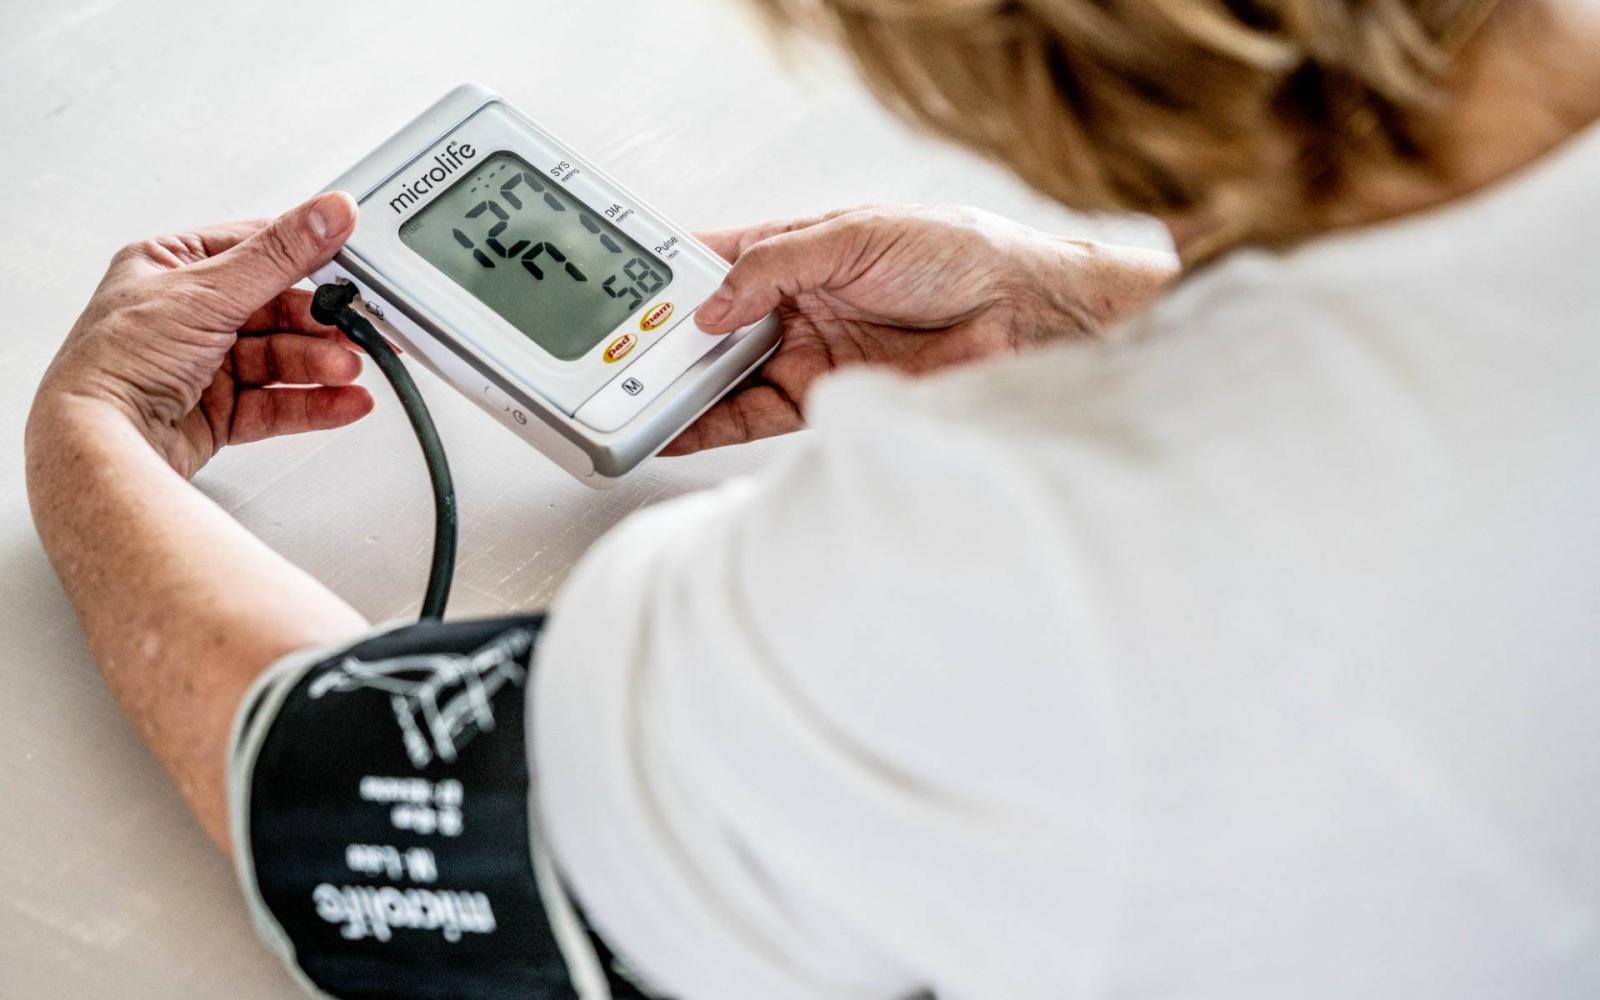 mik a 2 fokú magas vérnyomás tünetei alacsony vérnyomás a magas vérnyomás kezelésében